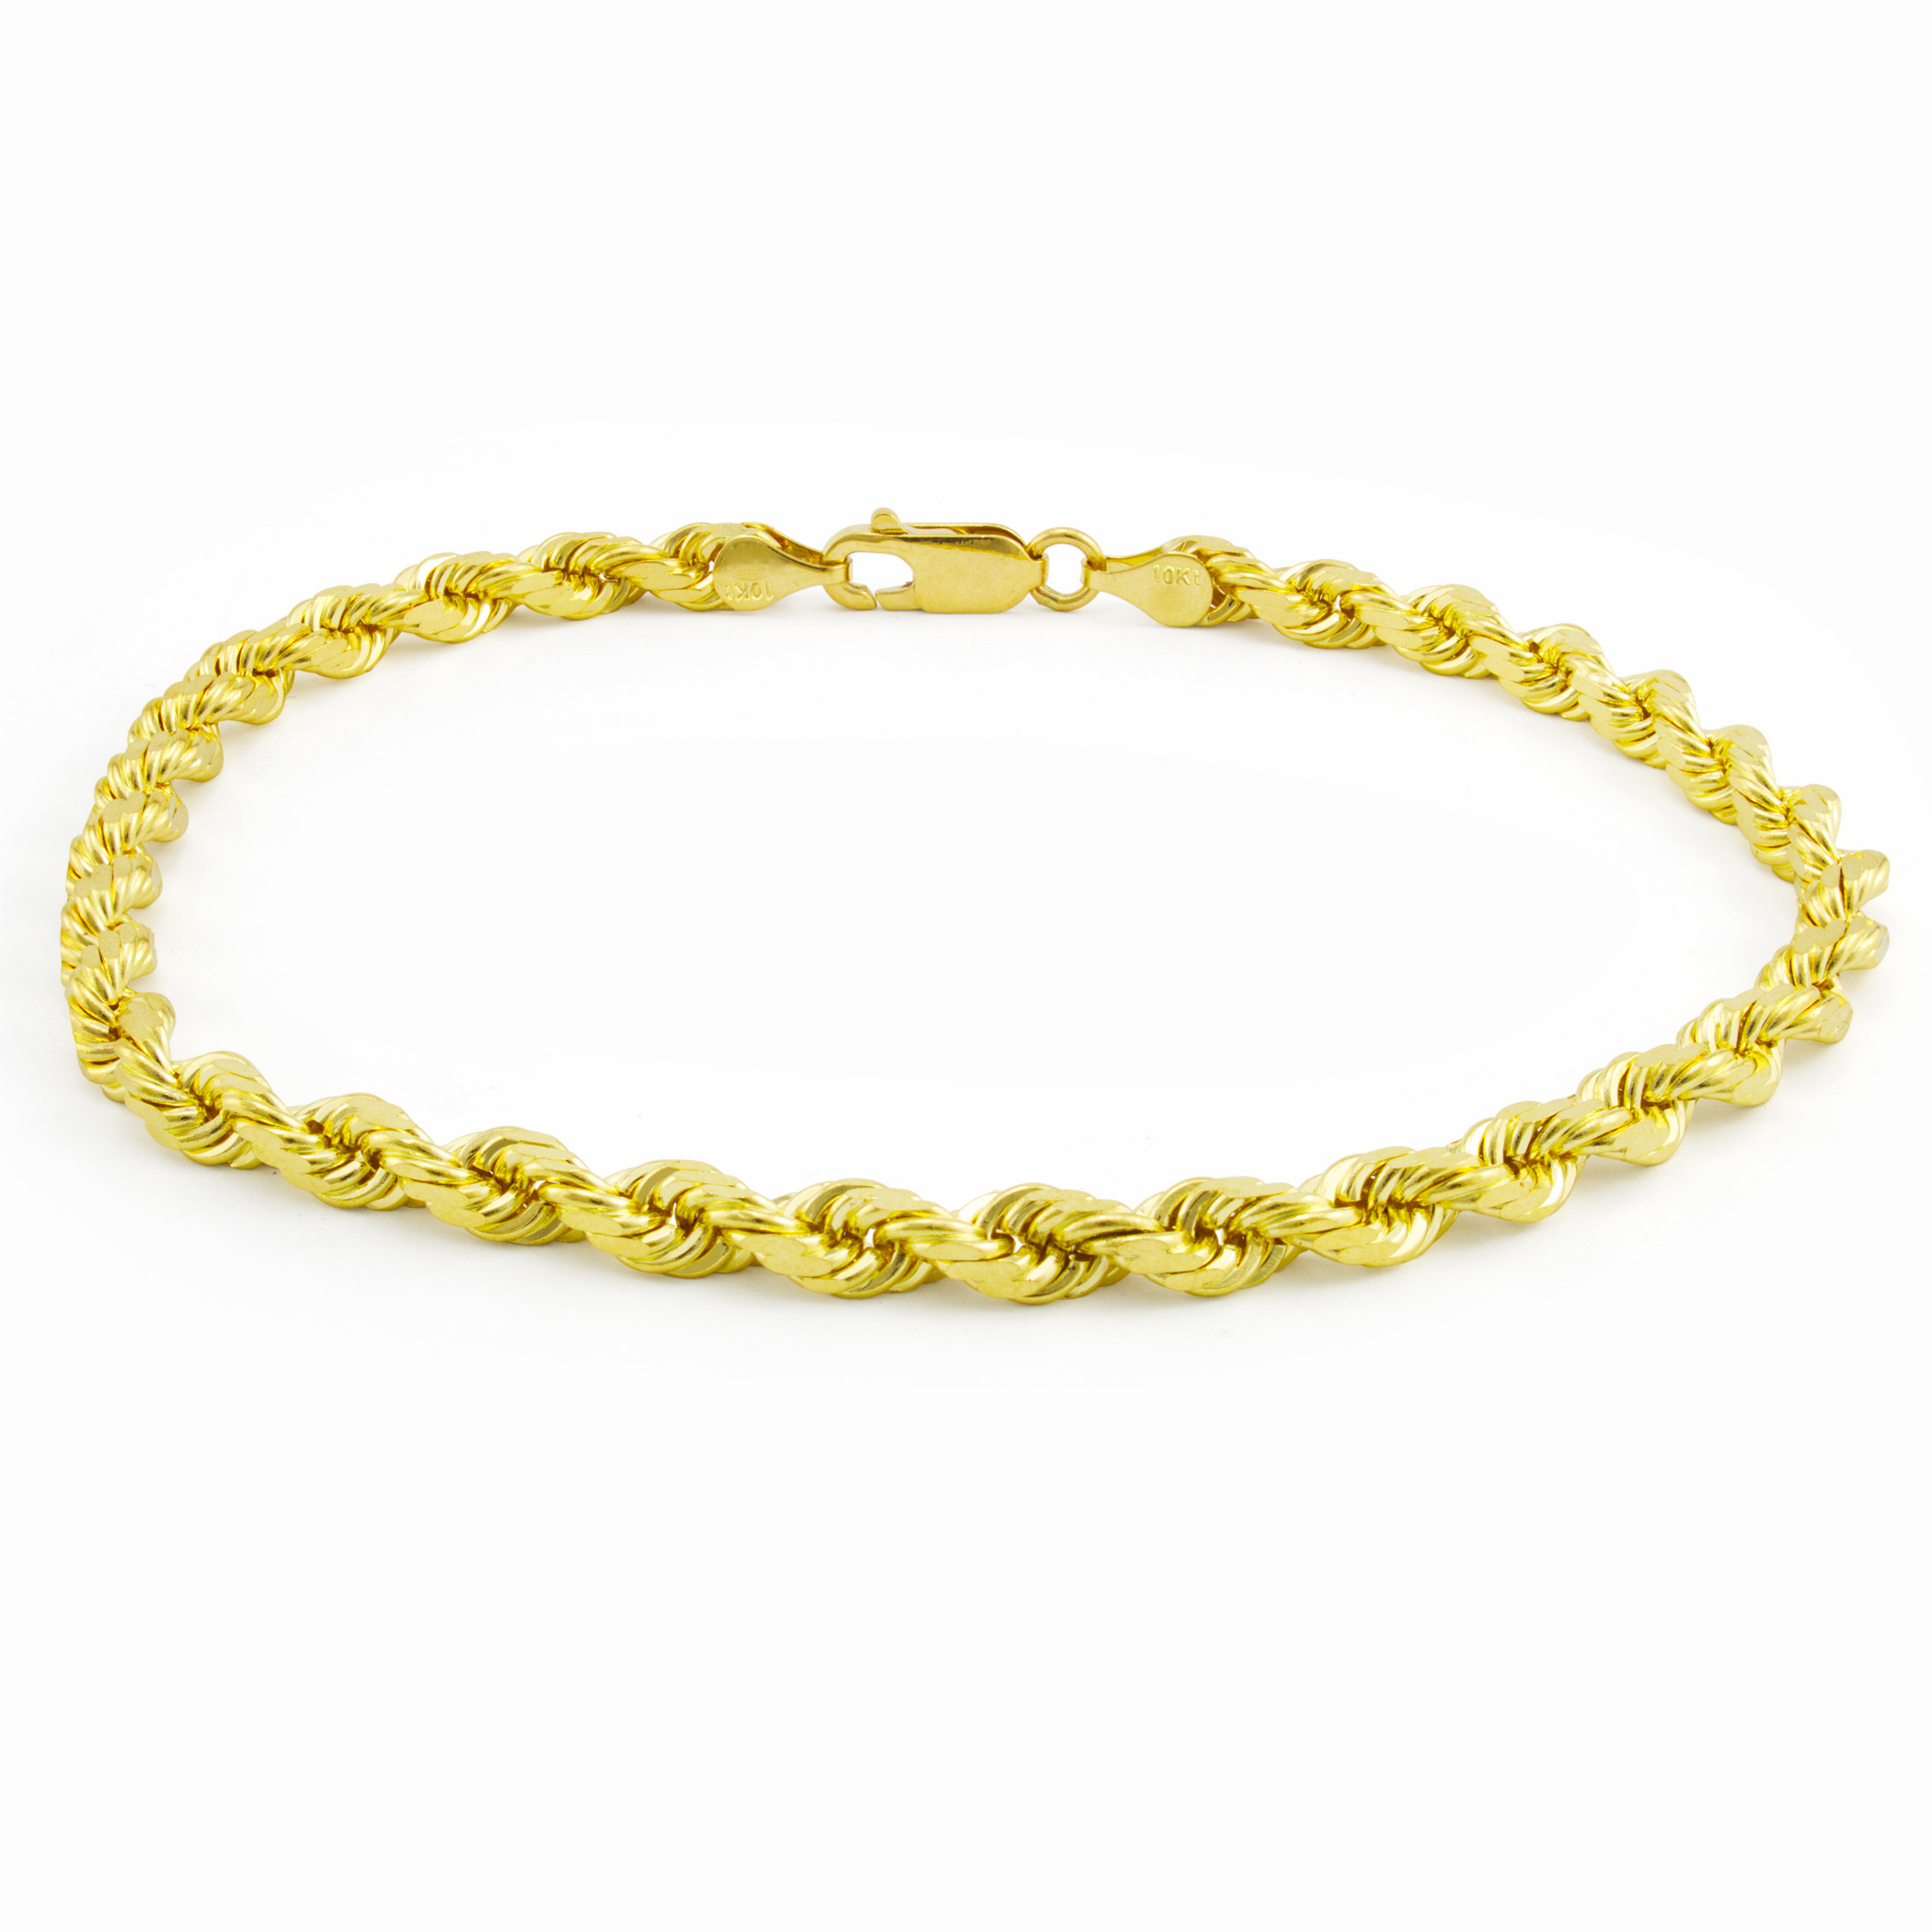 "10K Real Yellow Gold Men Womens 5mm Diamond Cut Rope Chain Bracelet 8"" 8.5"" 9"""